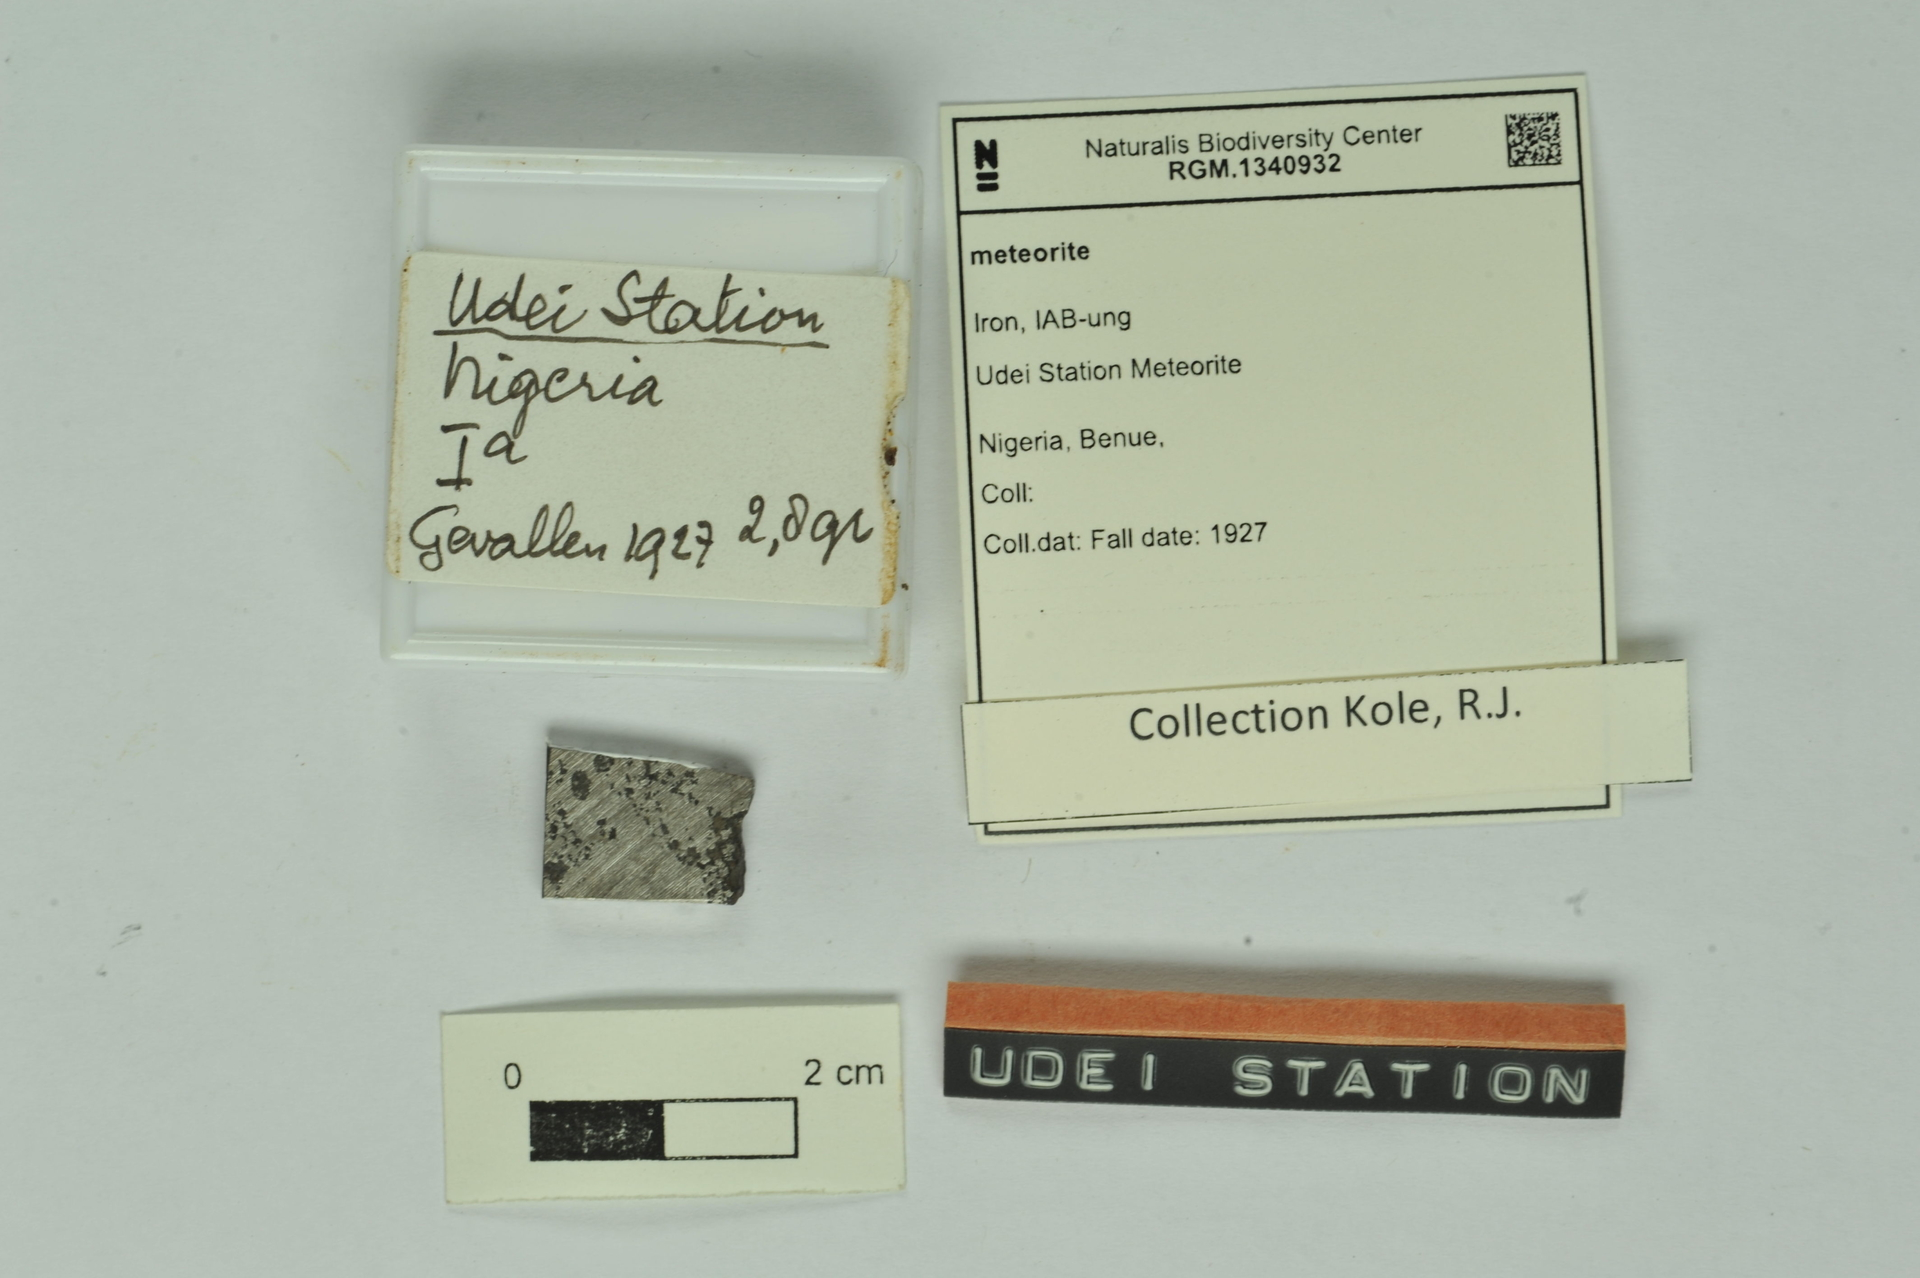 RGM.1340932   Iron, IAB-ung